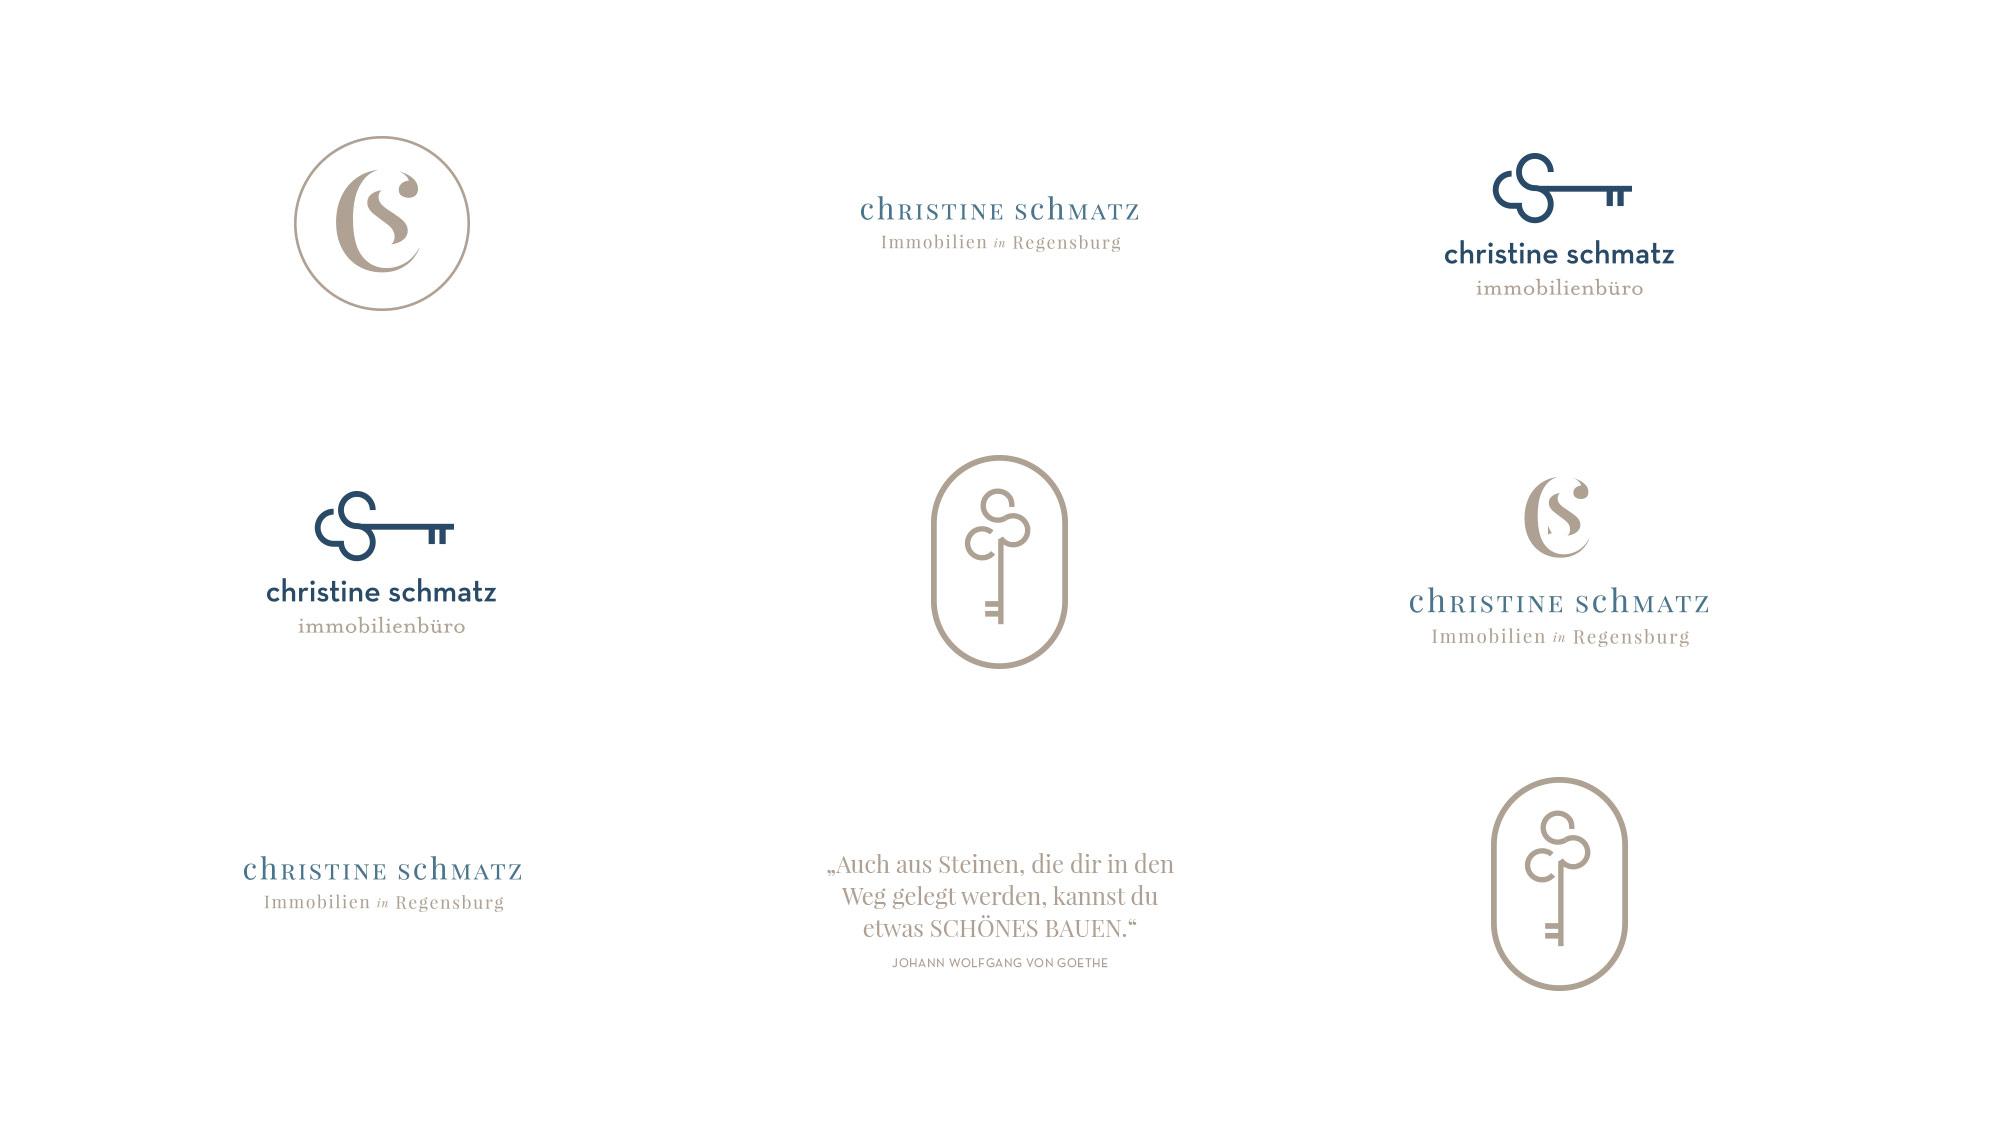 trc_christine-schmatz_logos